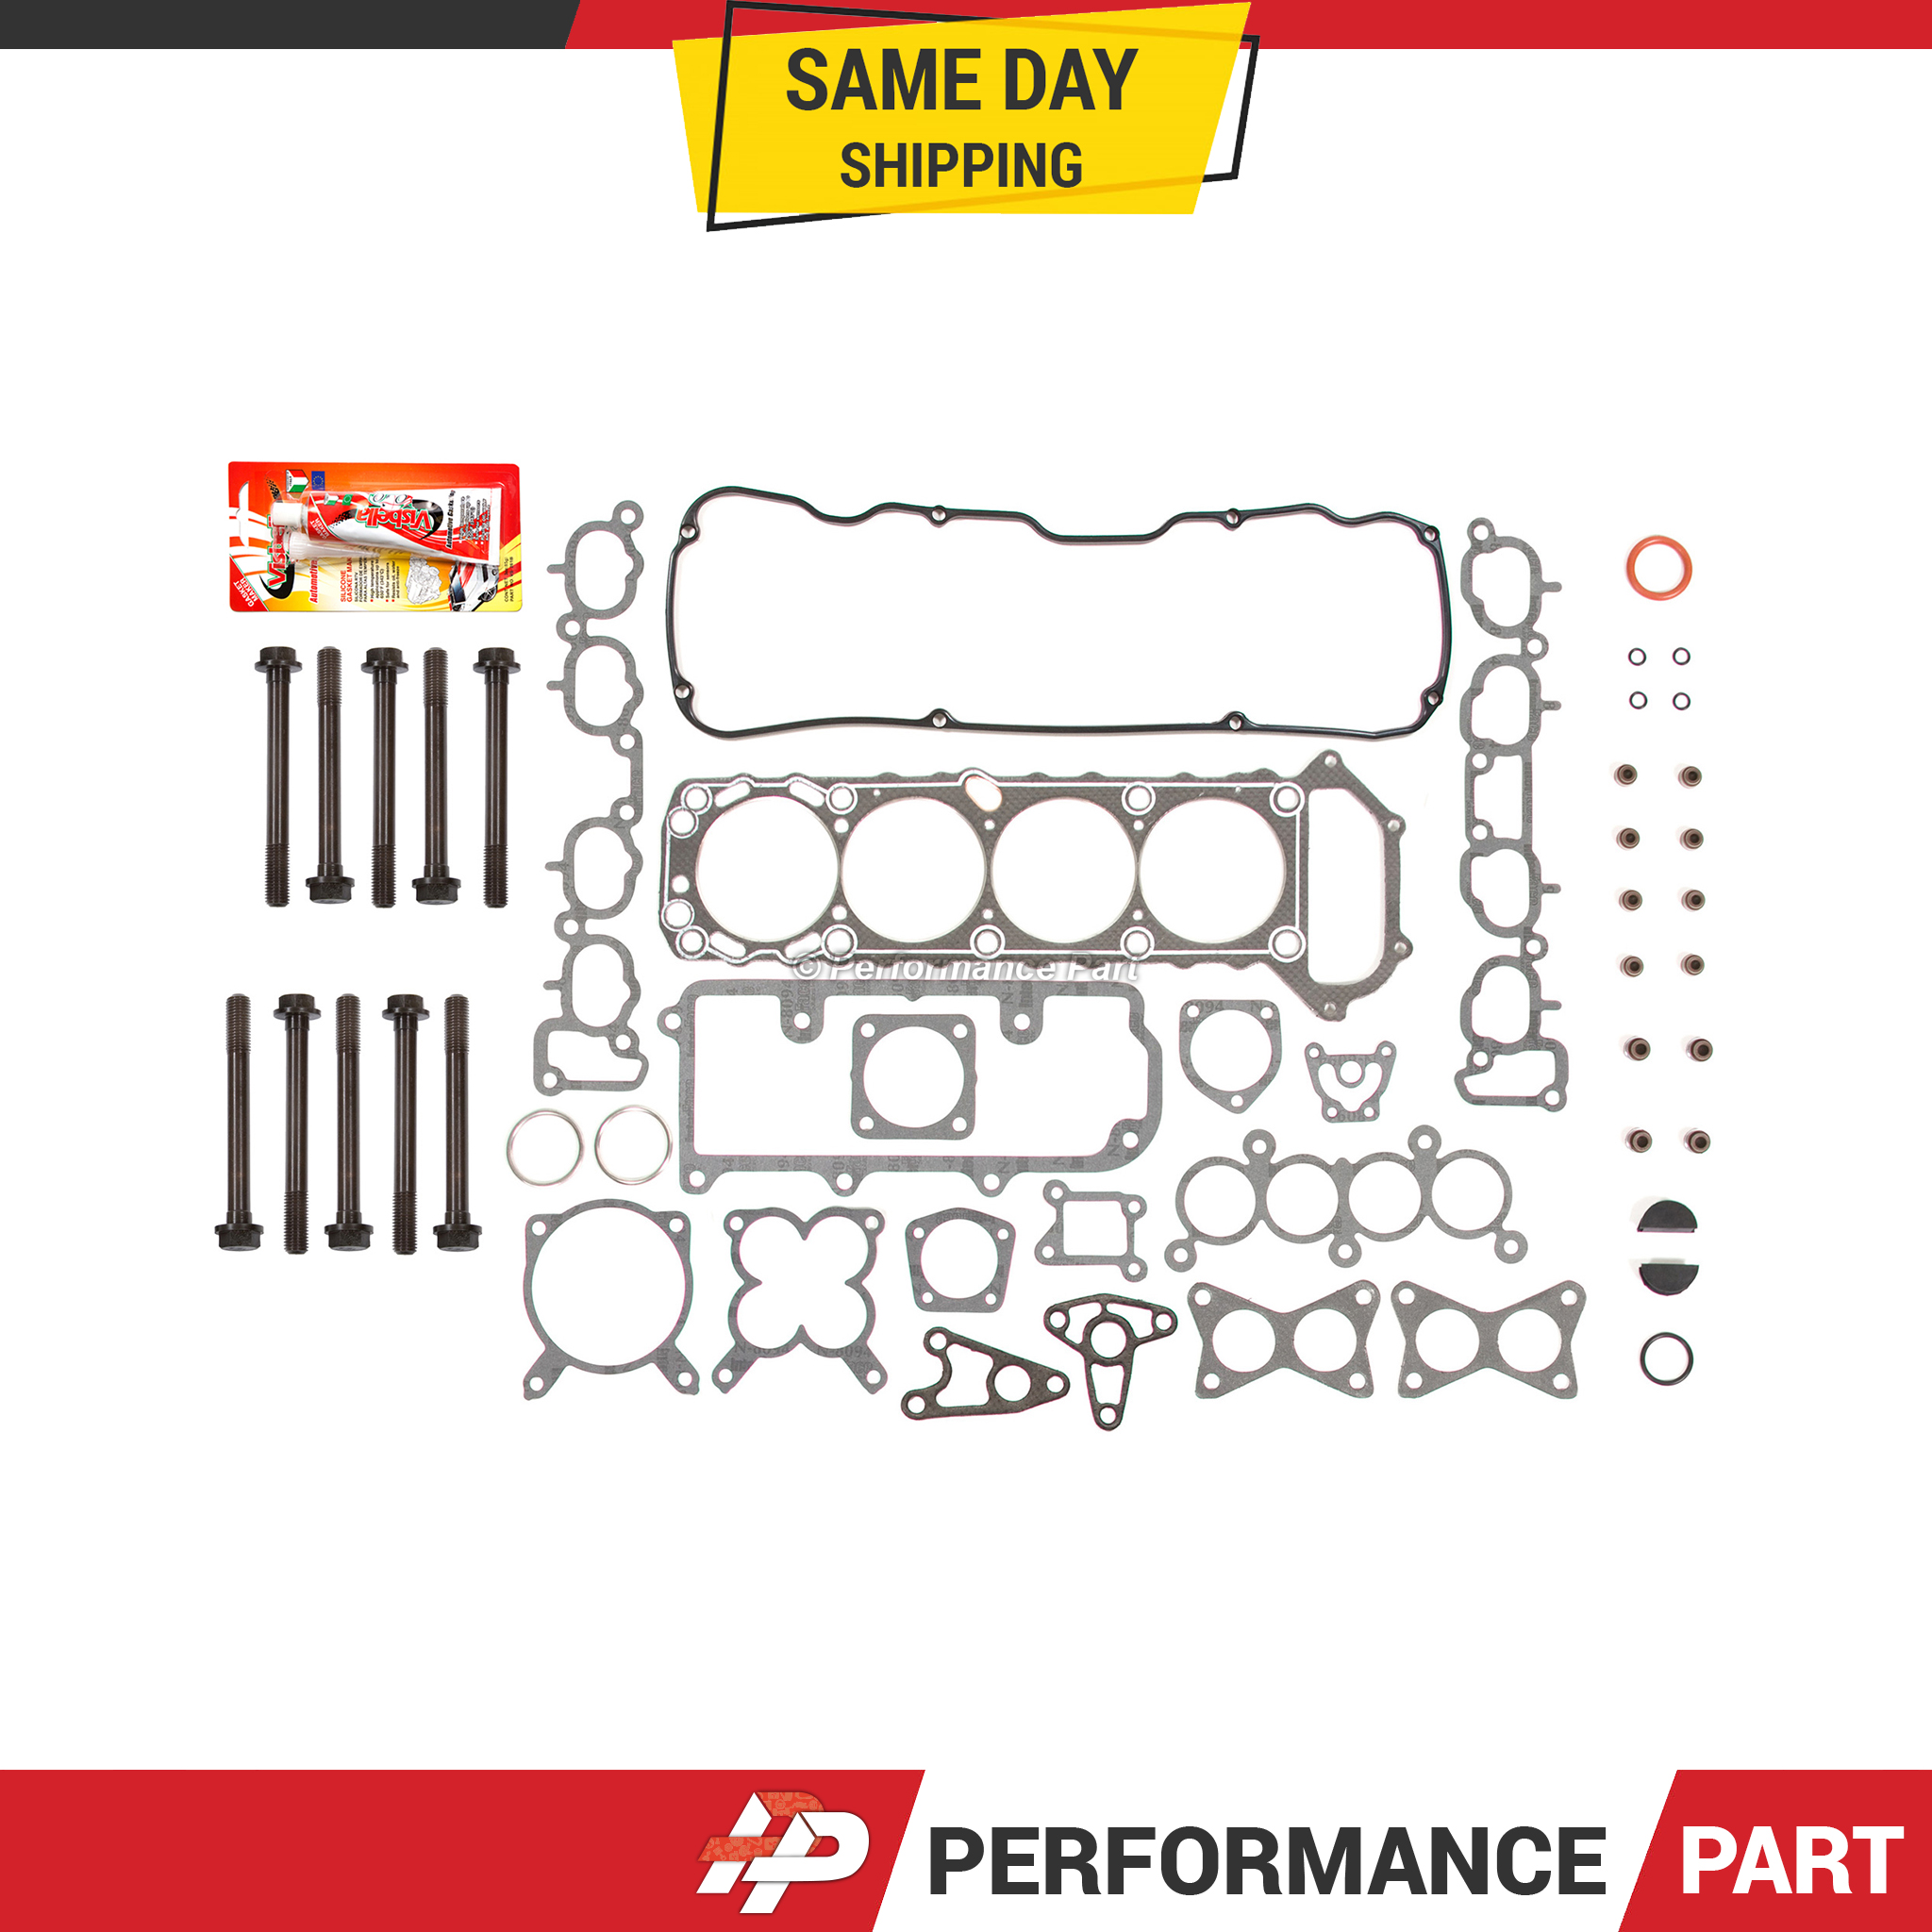 Cyl. Head & Valve Cover Gasket Head Gasket Bolts Set Fit 89-95 Nissan 240SX PickUp 2.4L SOHC KA24E Gaskets